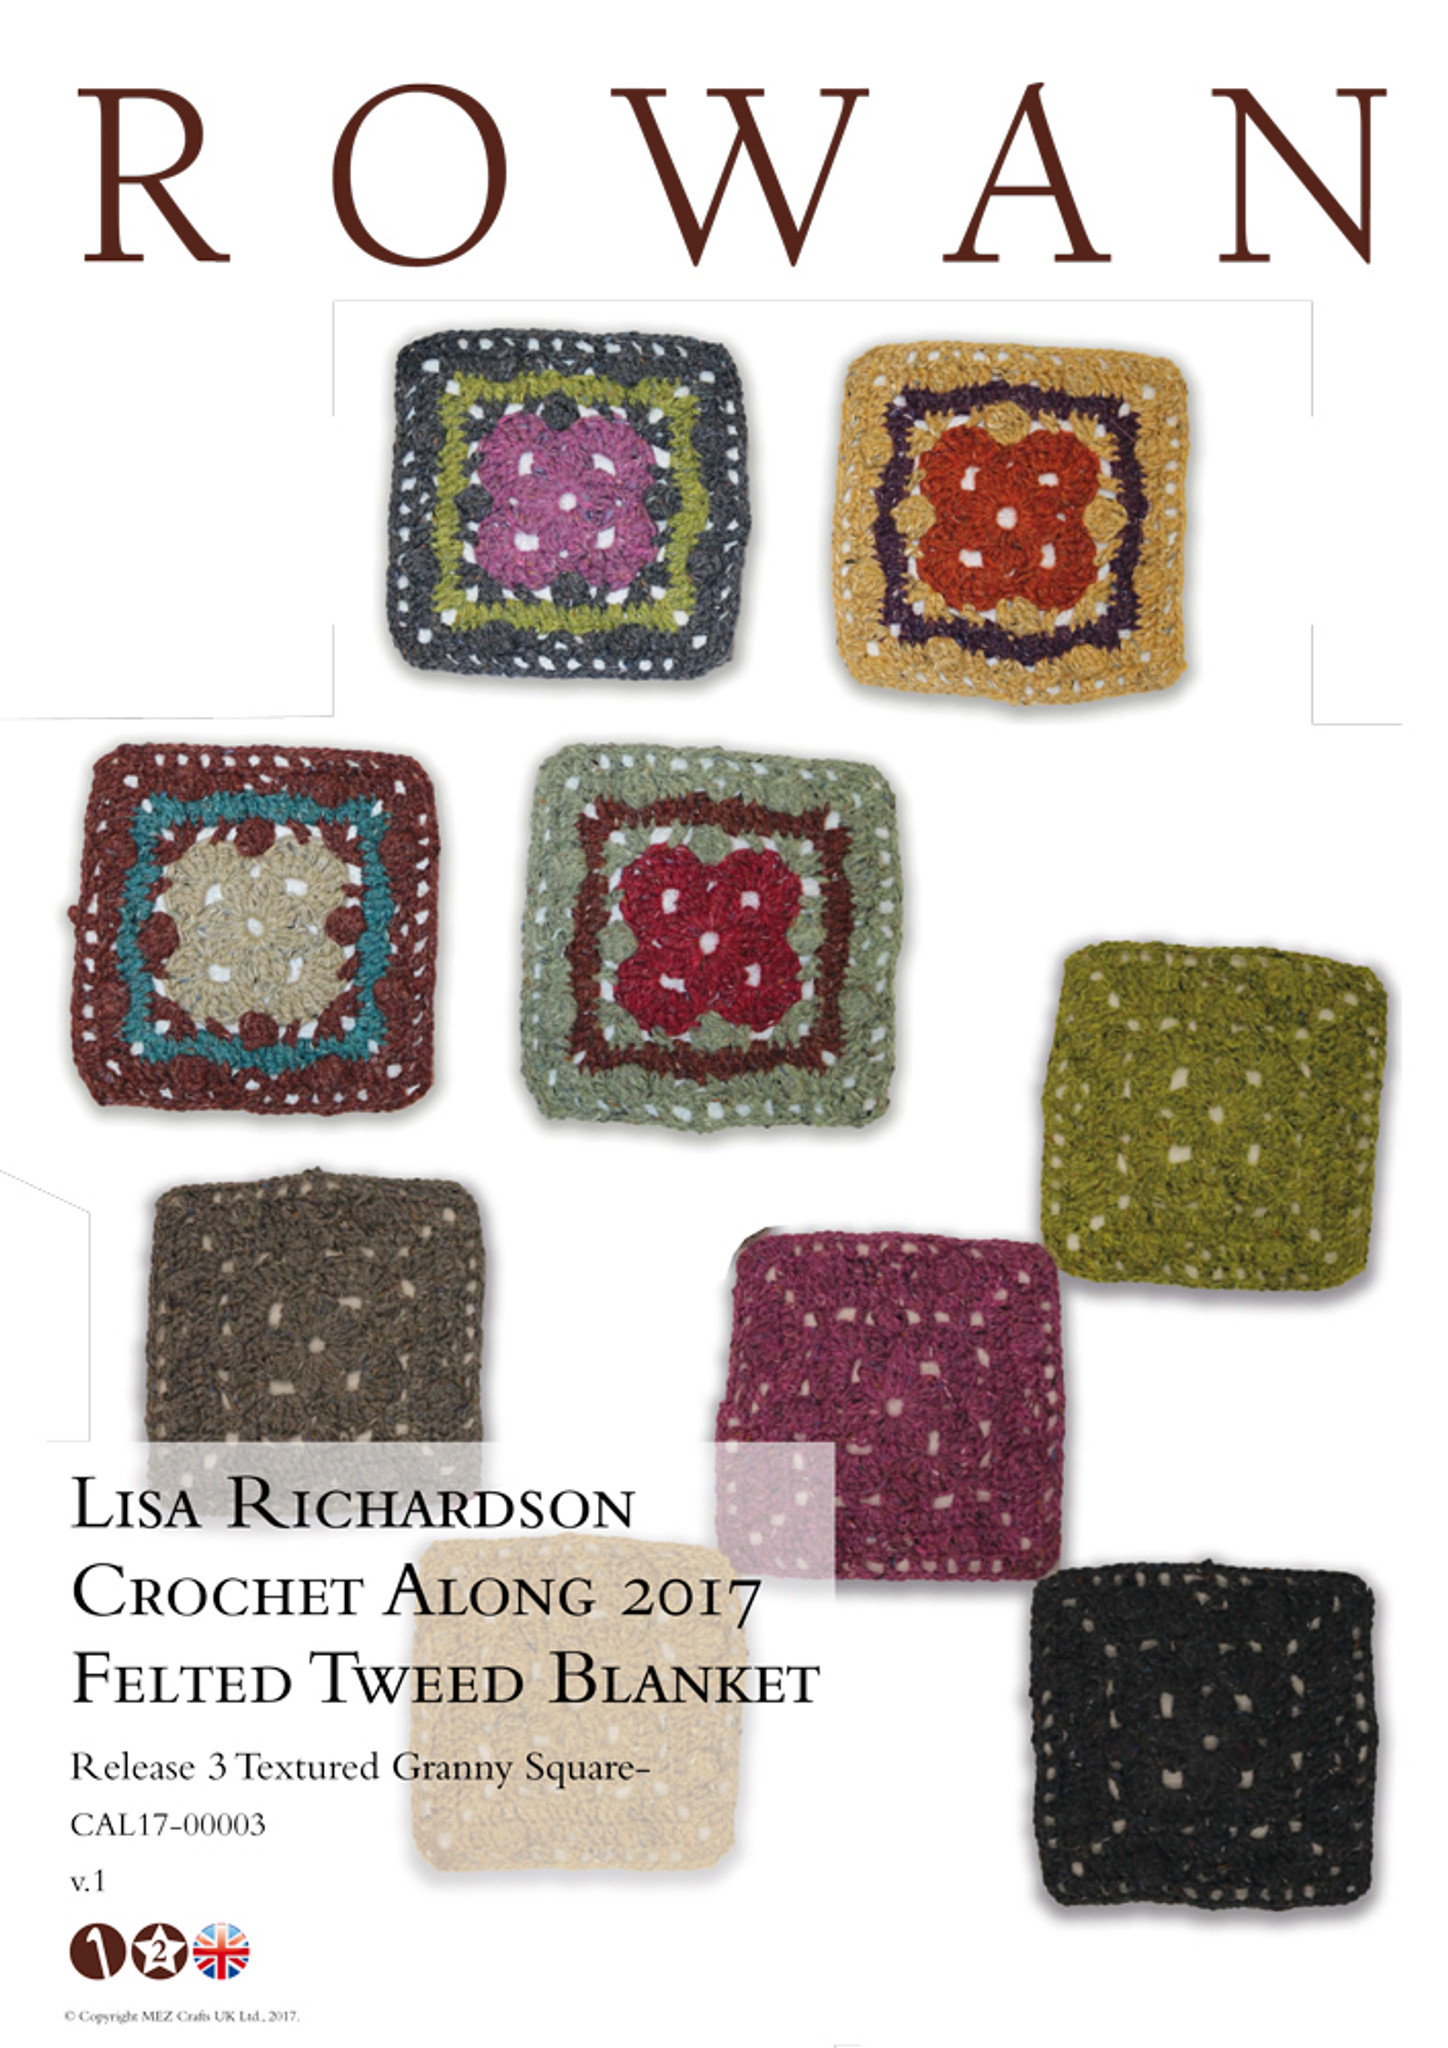 Rowan Knit Along no. 3 by Lisa Richardson - Textured Granny Square